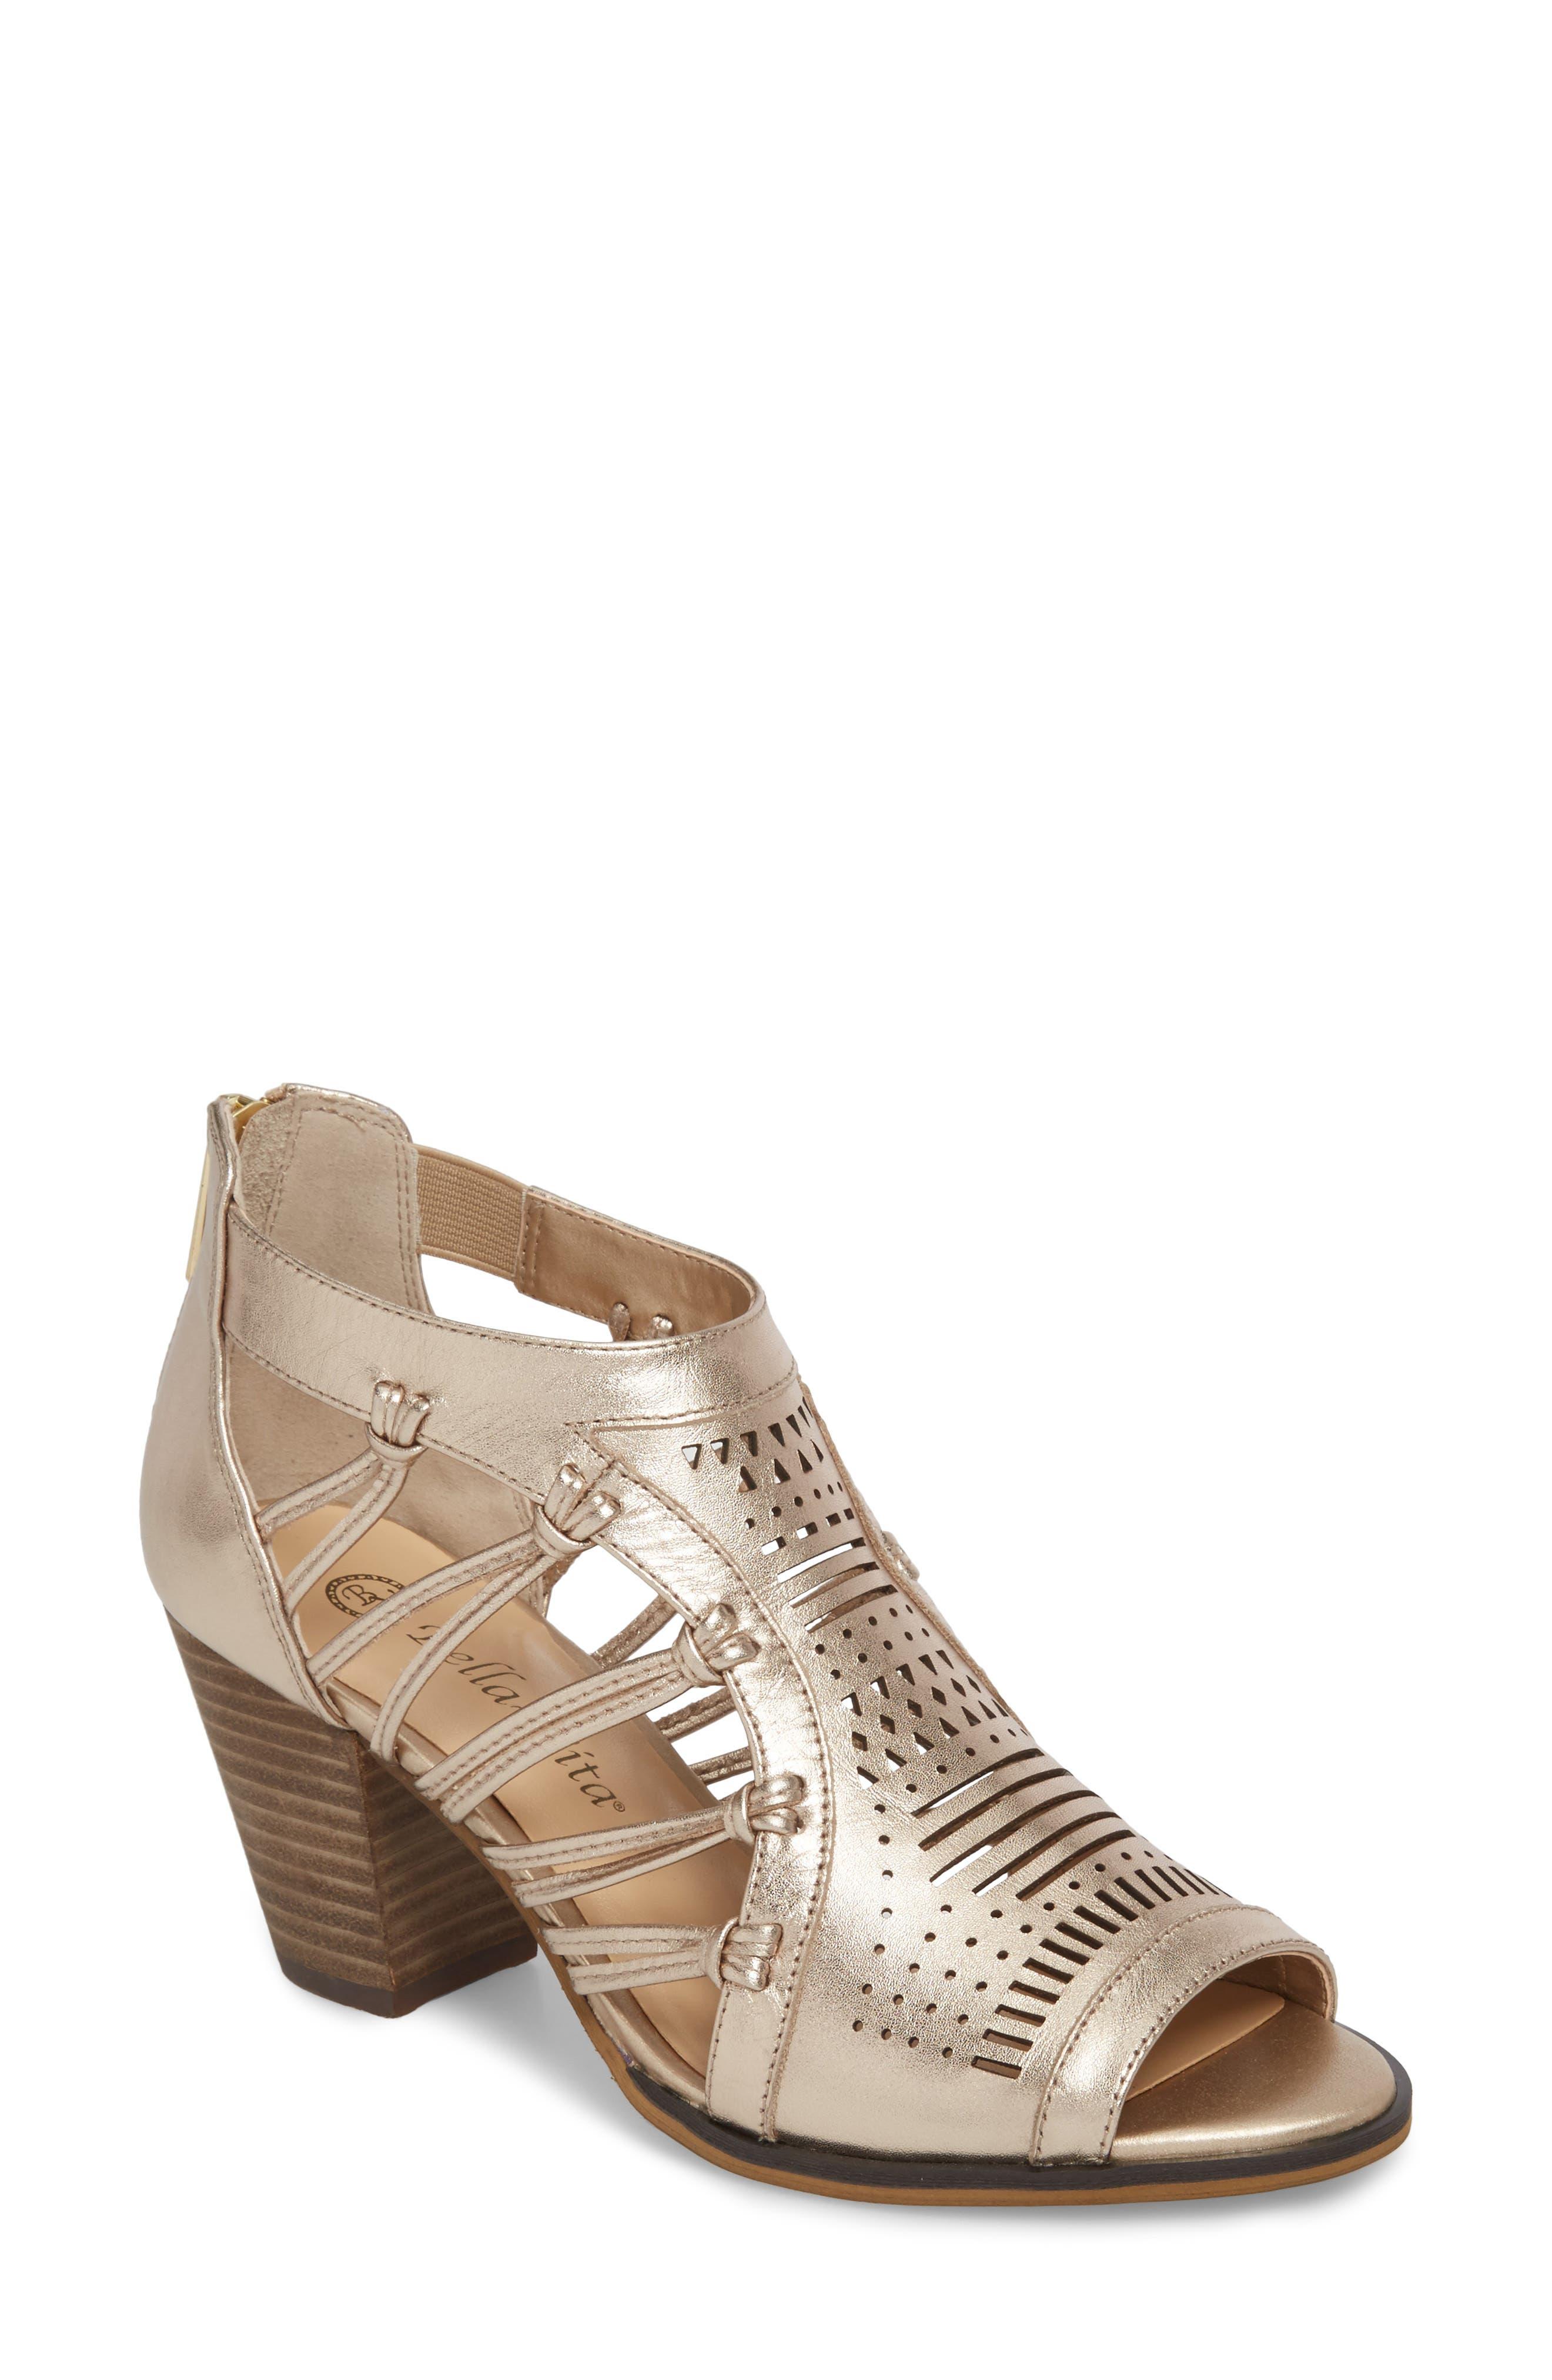 Bella Vita Kortez Block Heel Sandal, WW - Metallic